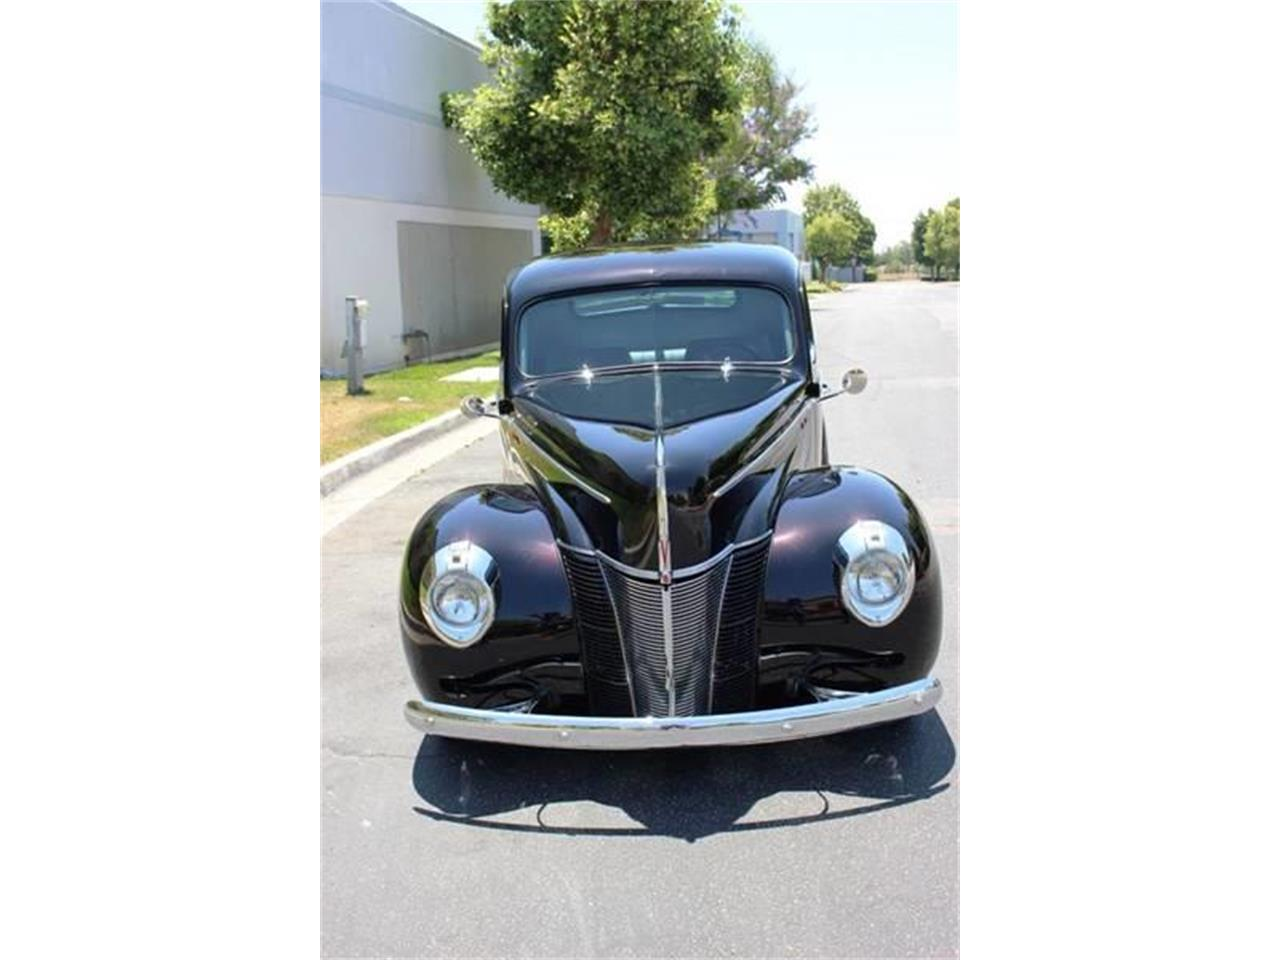 For Sale: 1940 Ford Coupe in La Verne, California